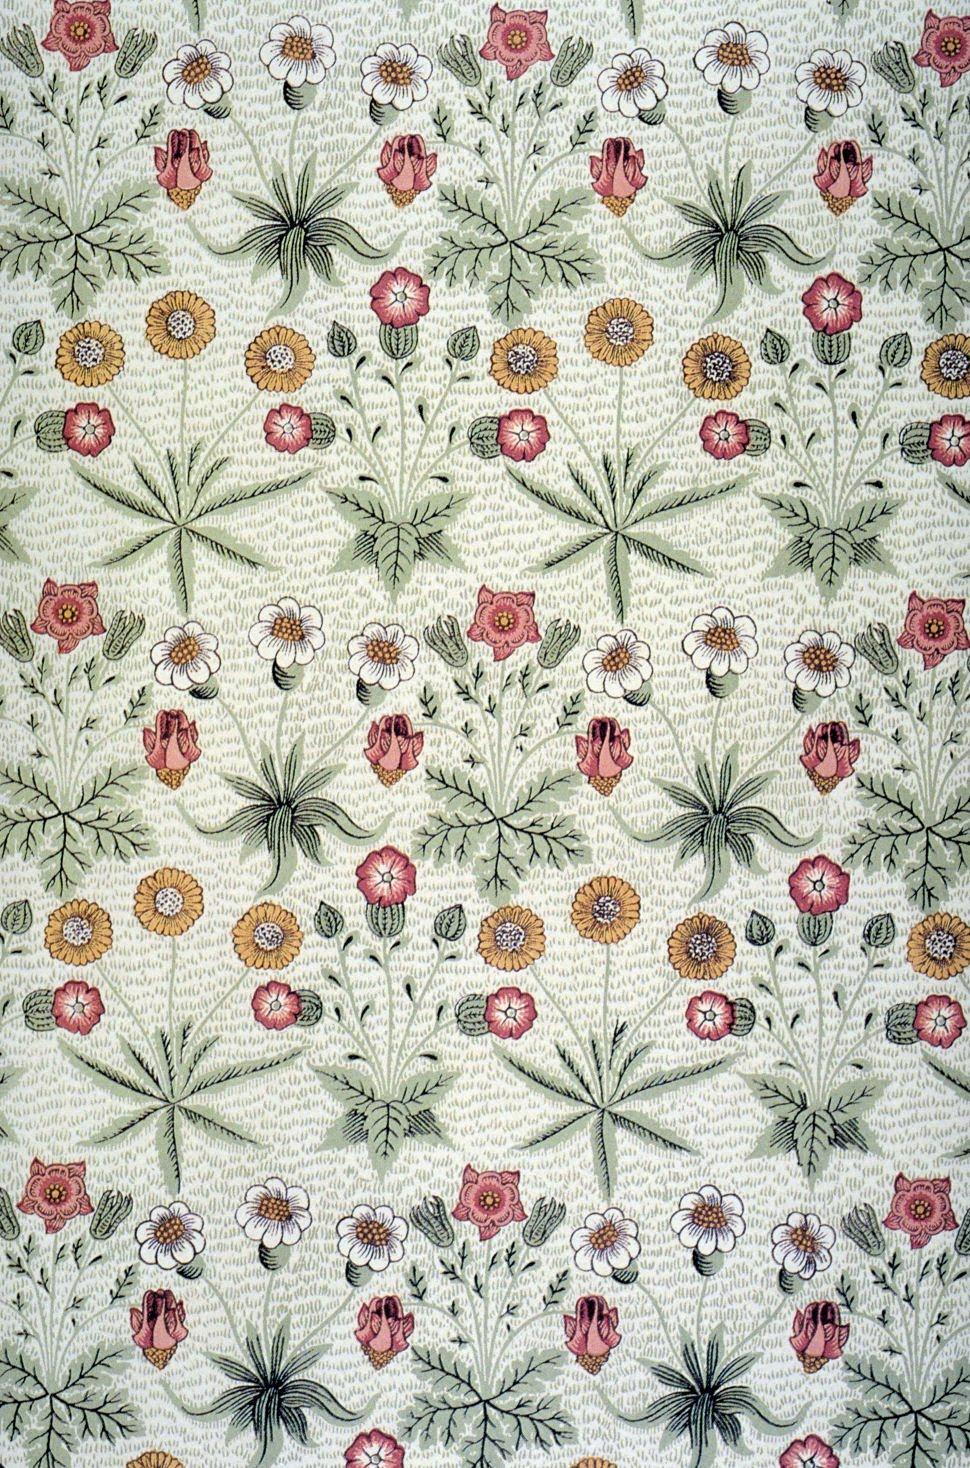 Daisy wallpaper designed by William Morris, 1864